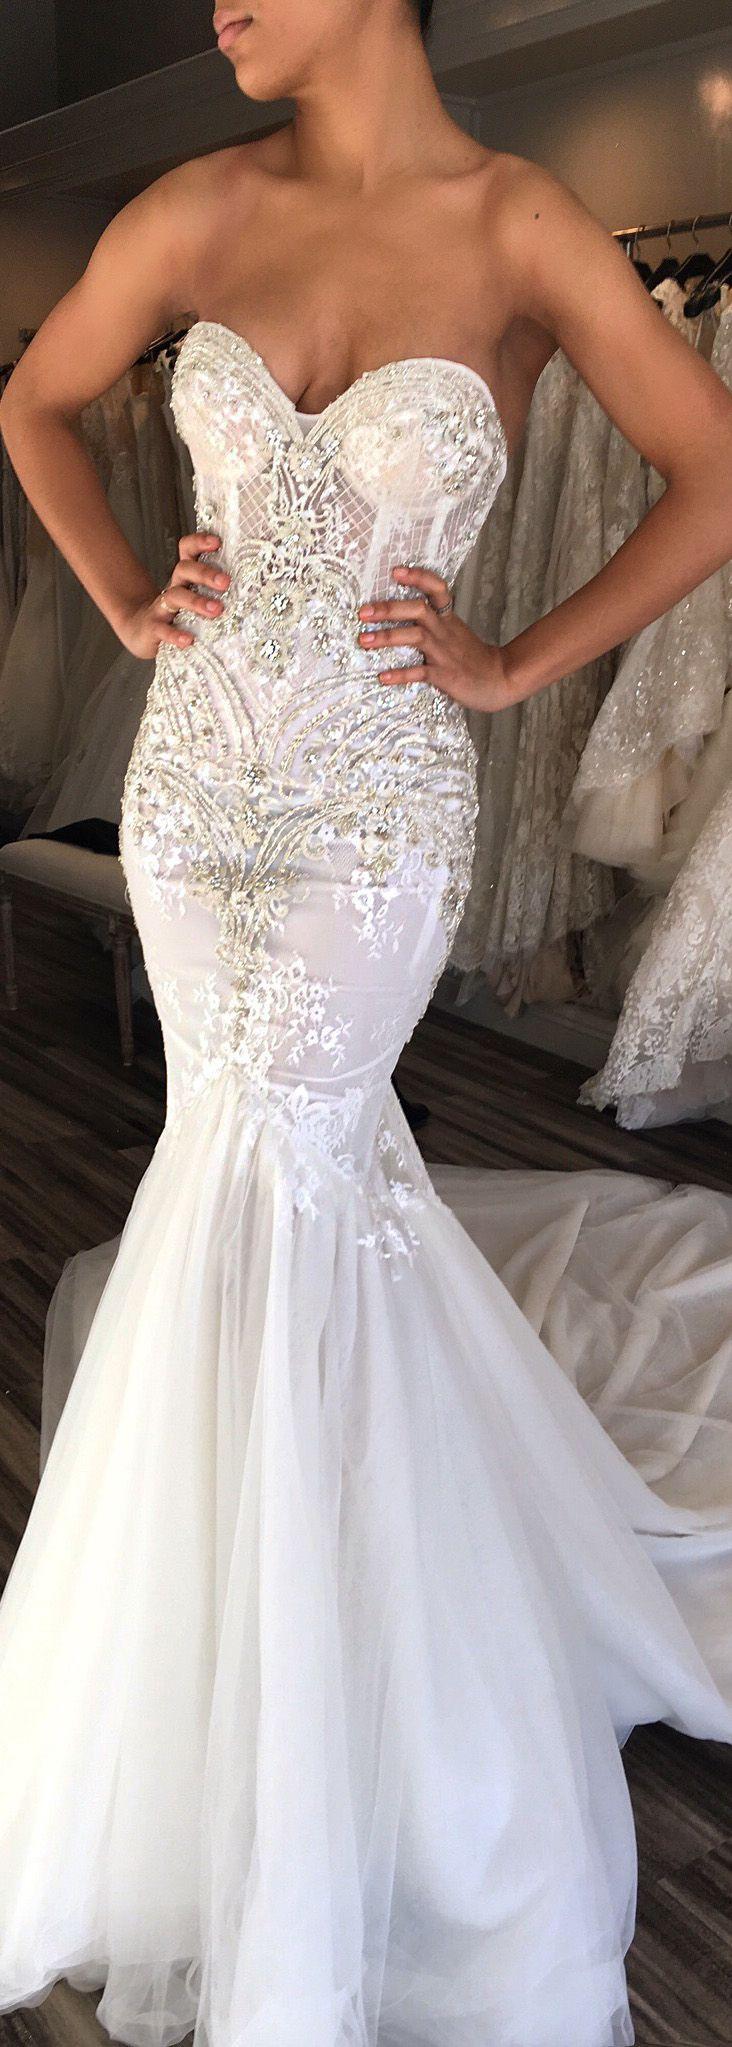 Best 25 berta bridal ideas on pinterest wedding dresses for My perfect wedding dress